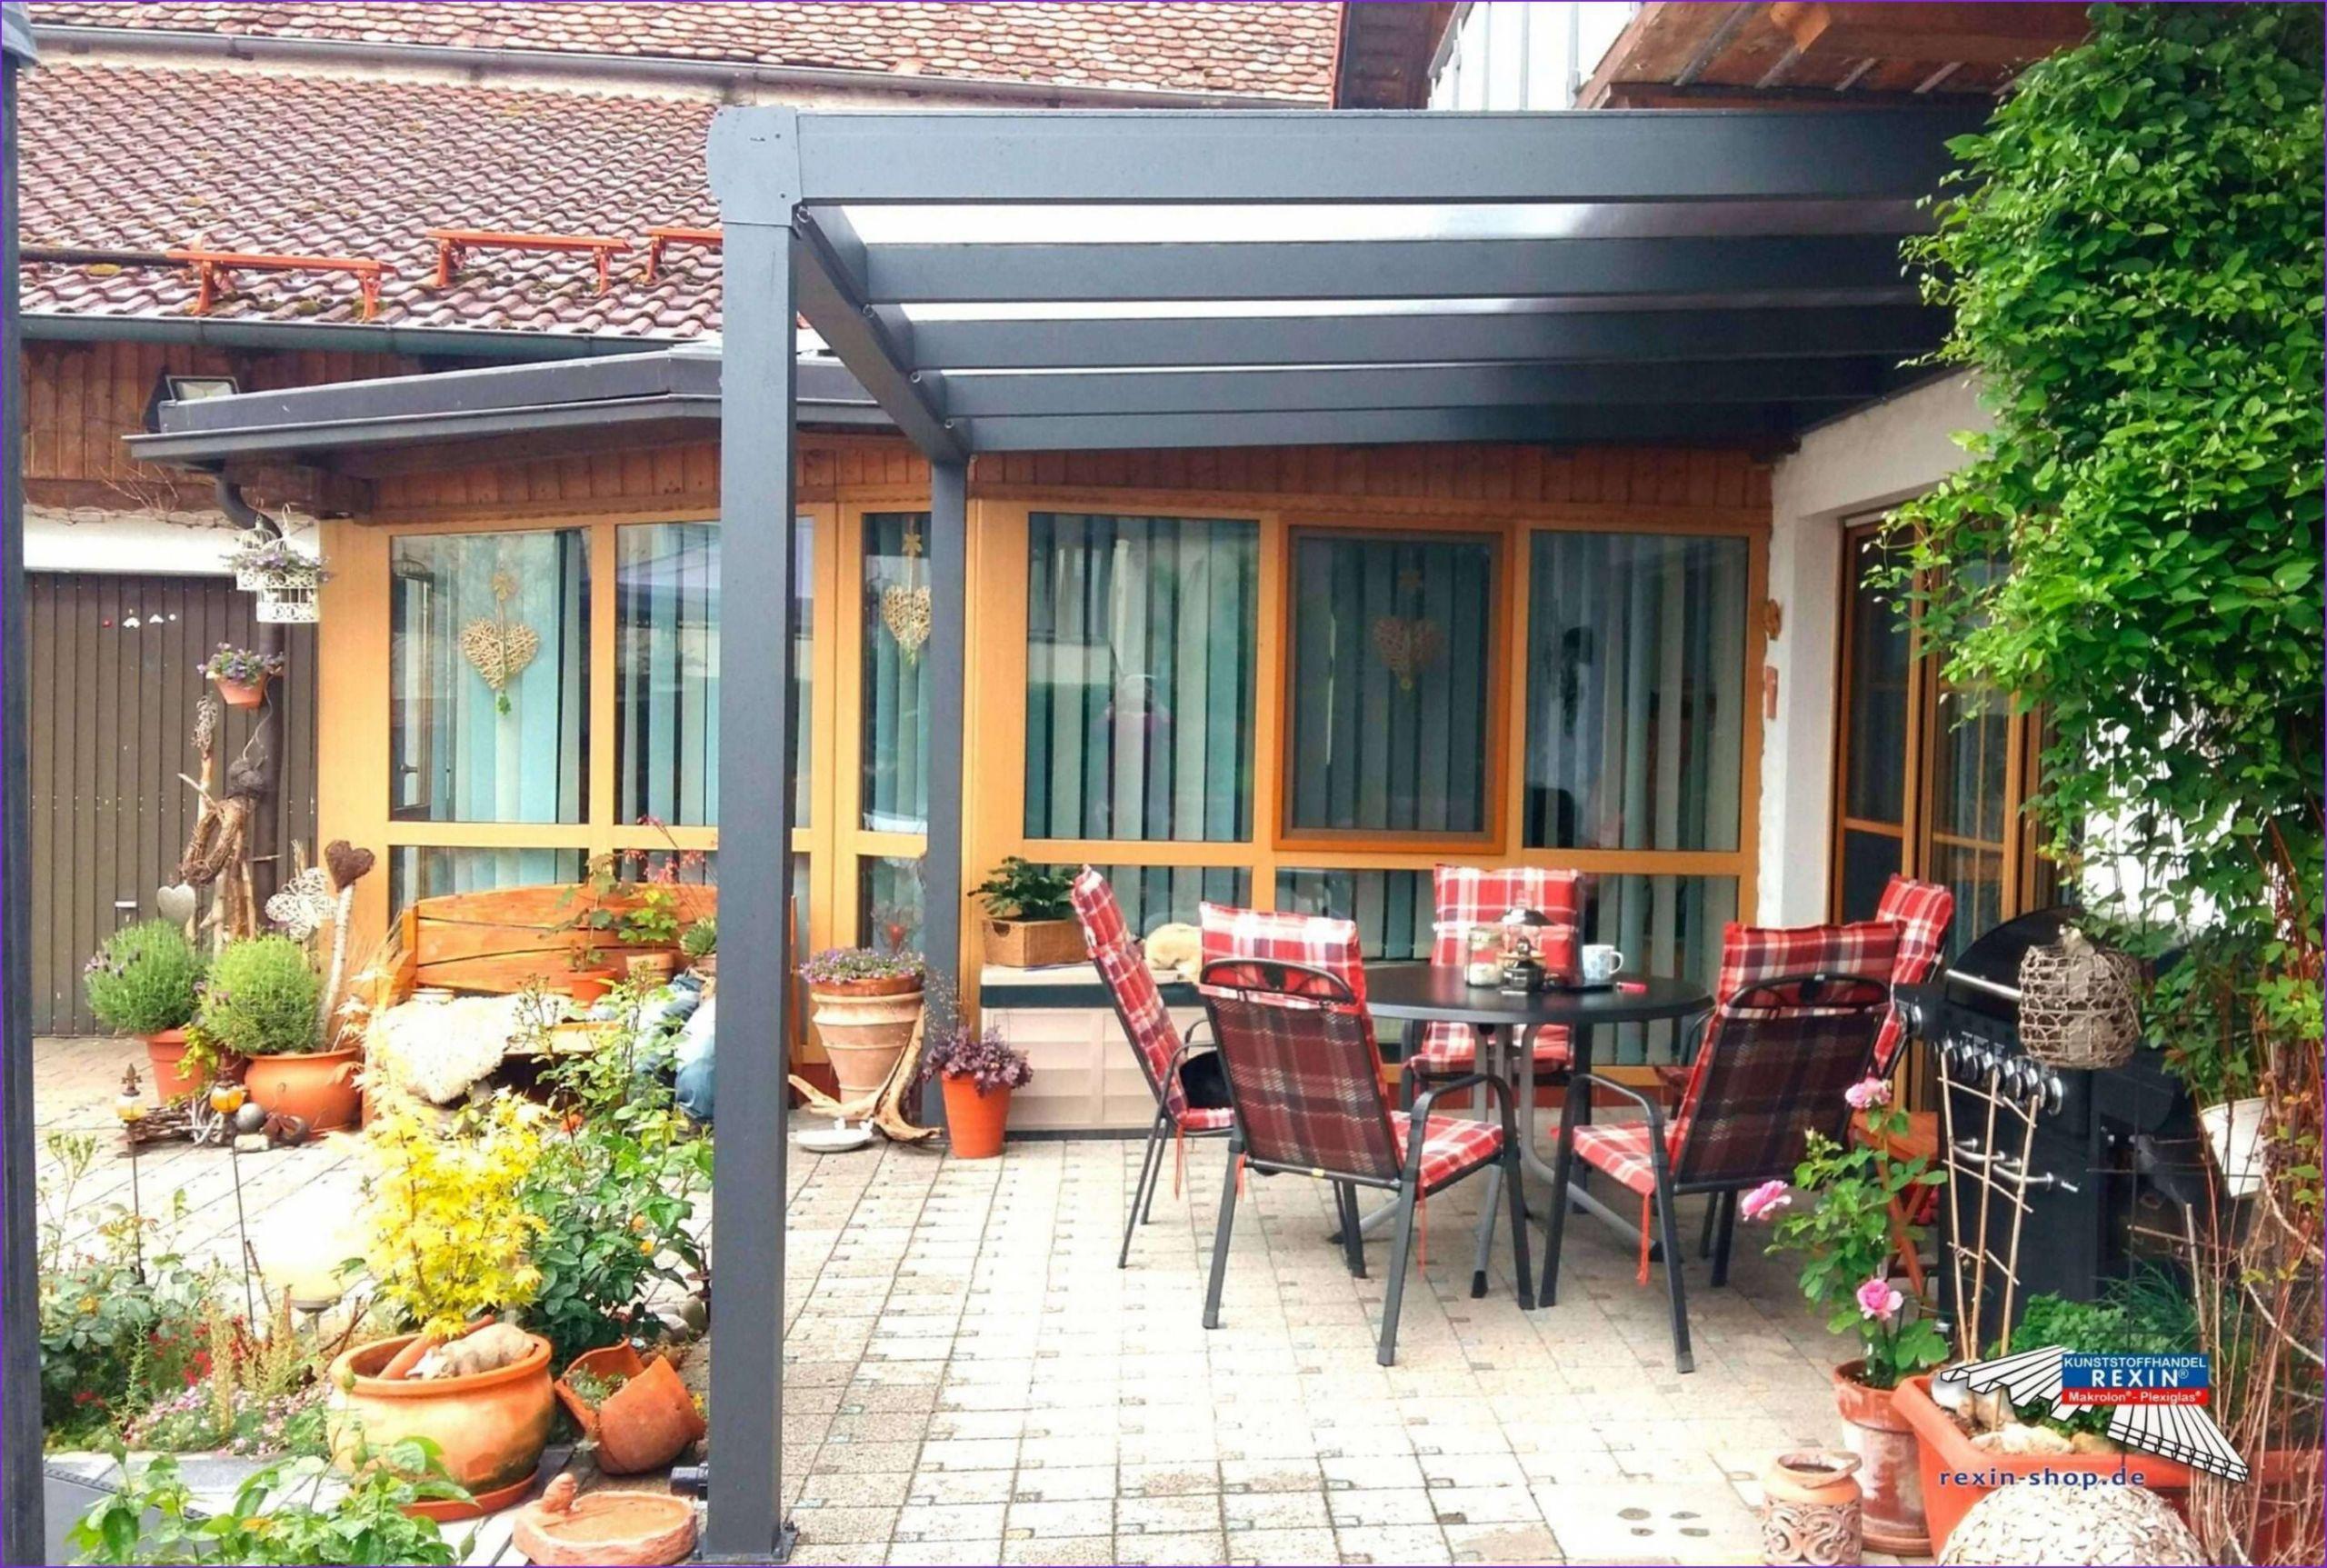 33 einzigartig deko ideen selber machen garten terrassen deko selber machen terrassen deko selber machen